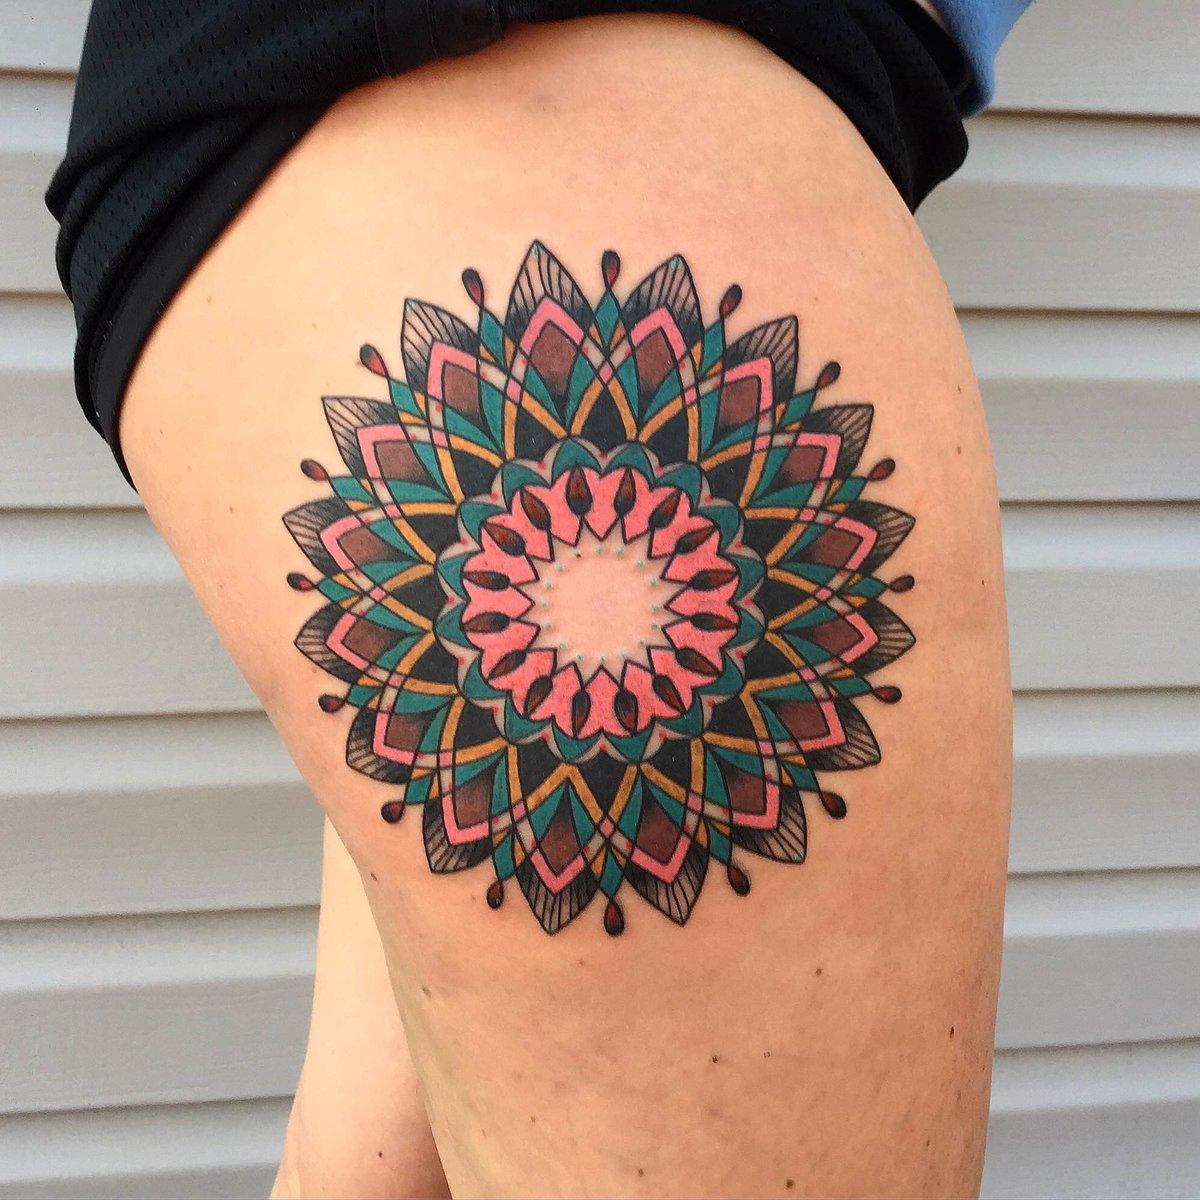 Shawn dougherty tattoo artist in wilmington nc 17 best for Wilmington nc tattoo